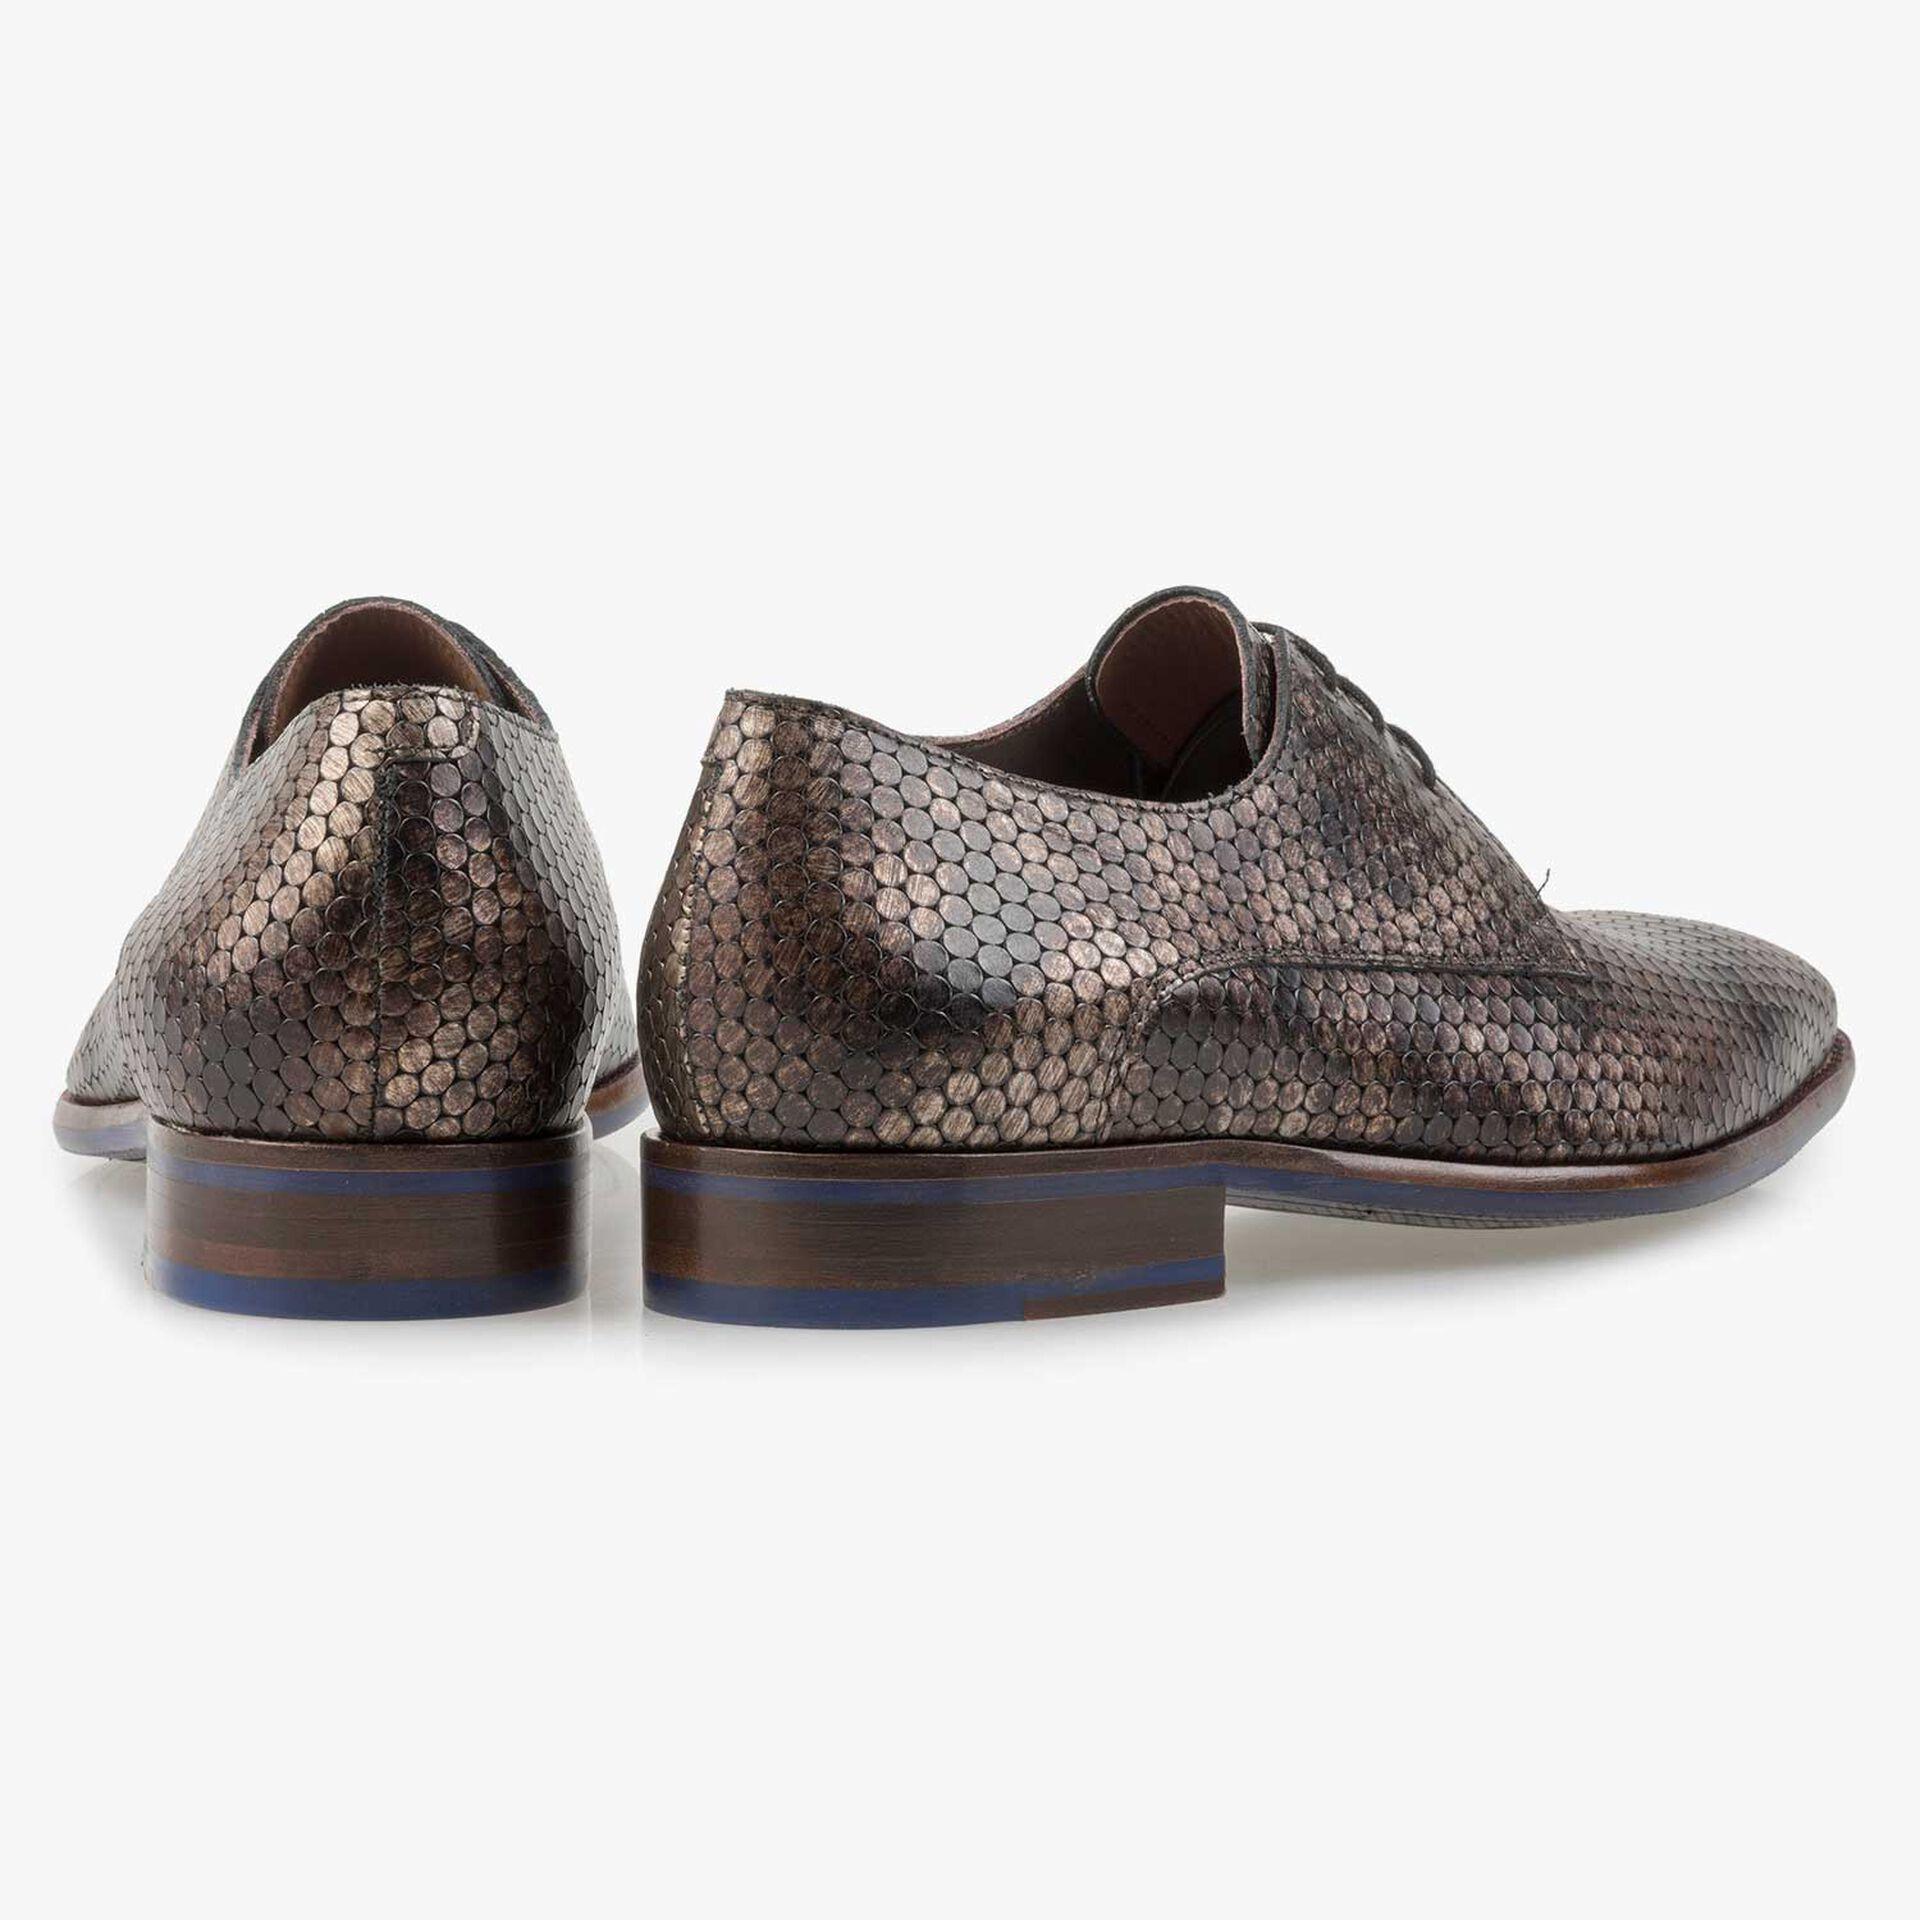 Brown metallic print leather lace shoe